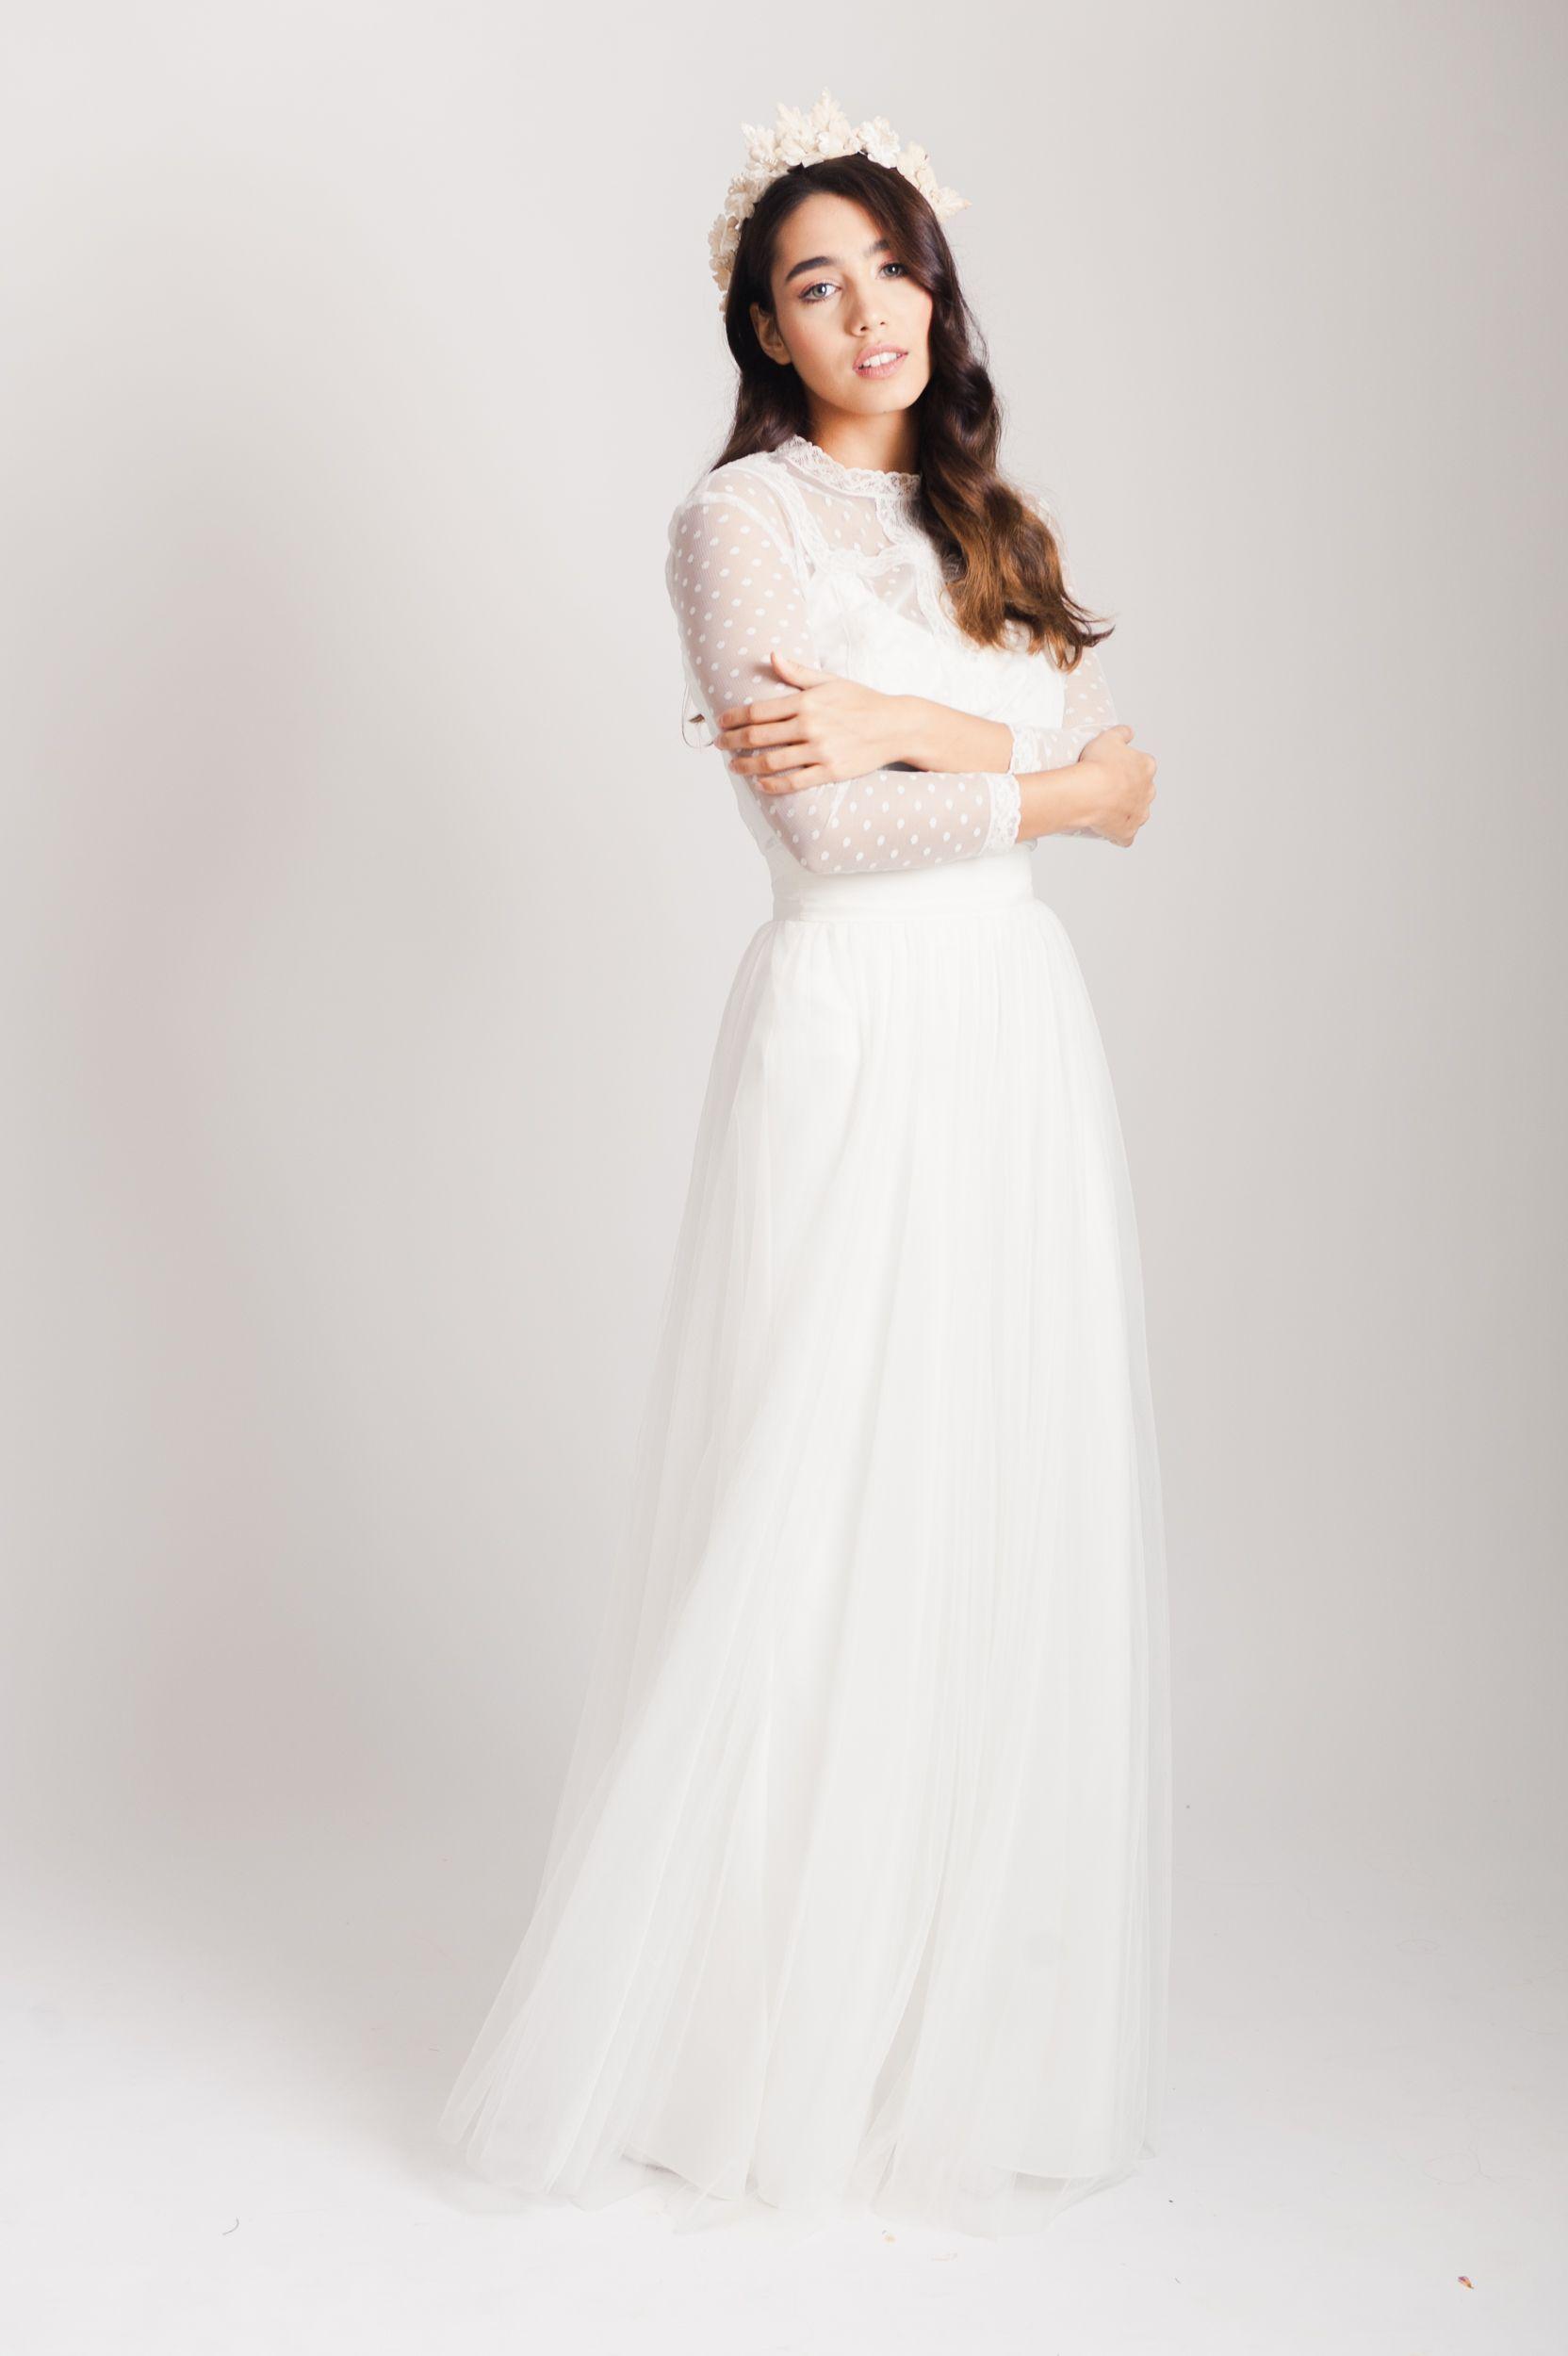 d6e5f3d9b Lace Wedding Dress Topper Uk